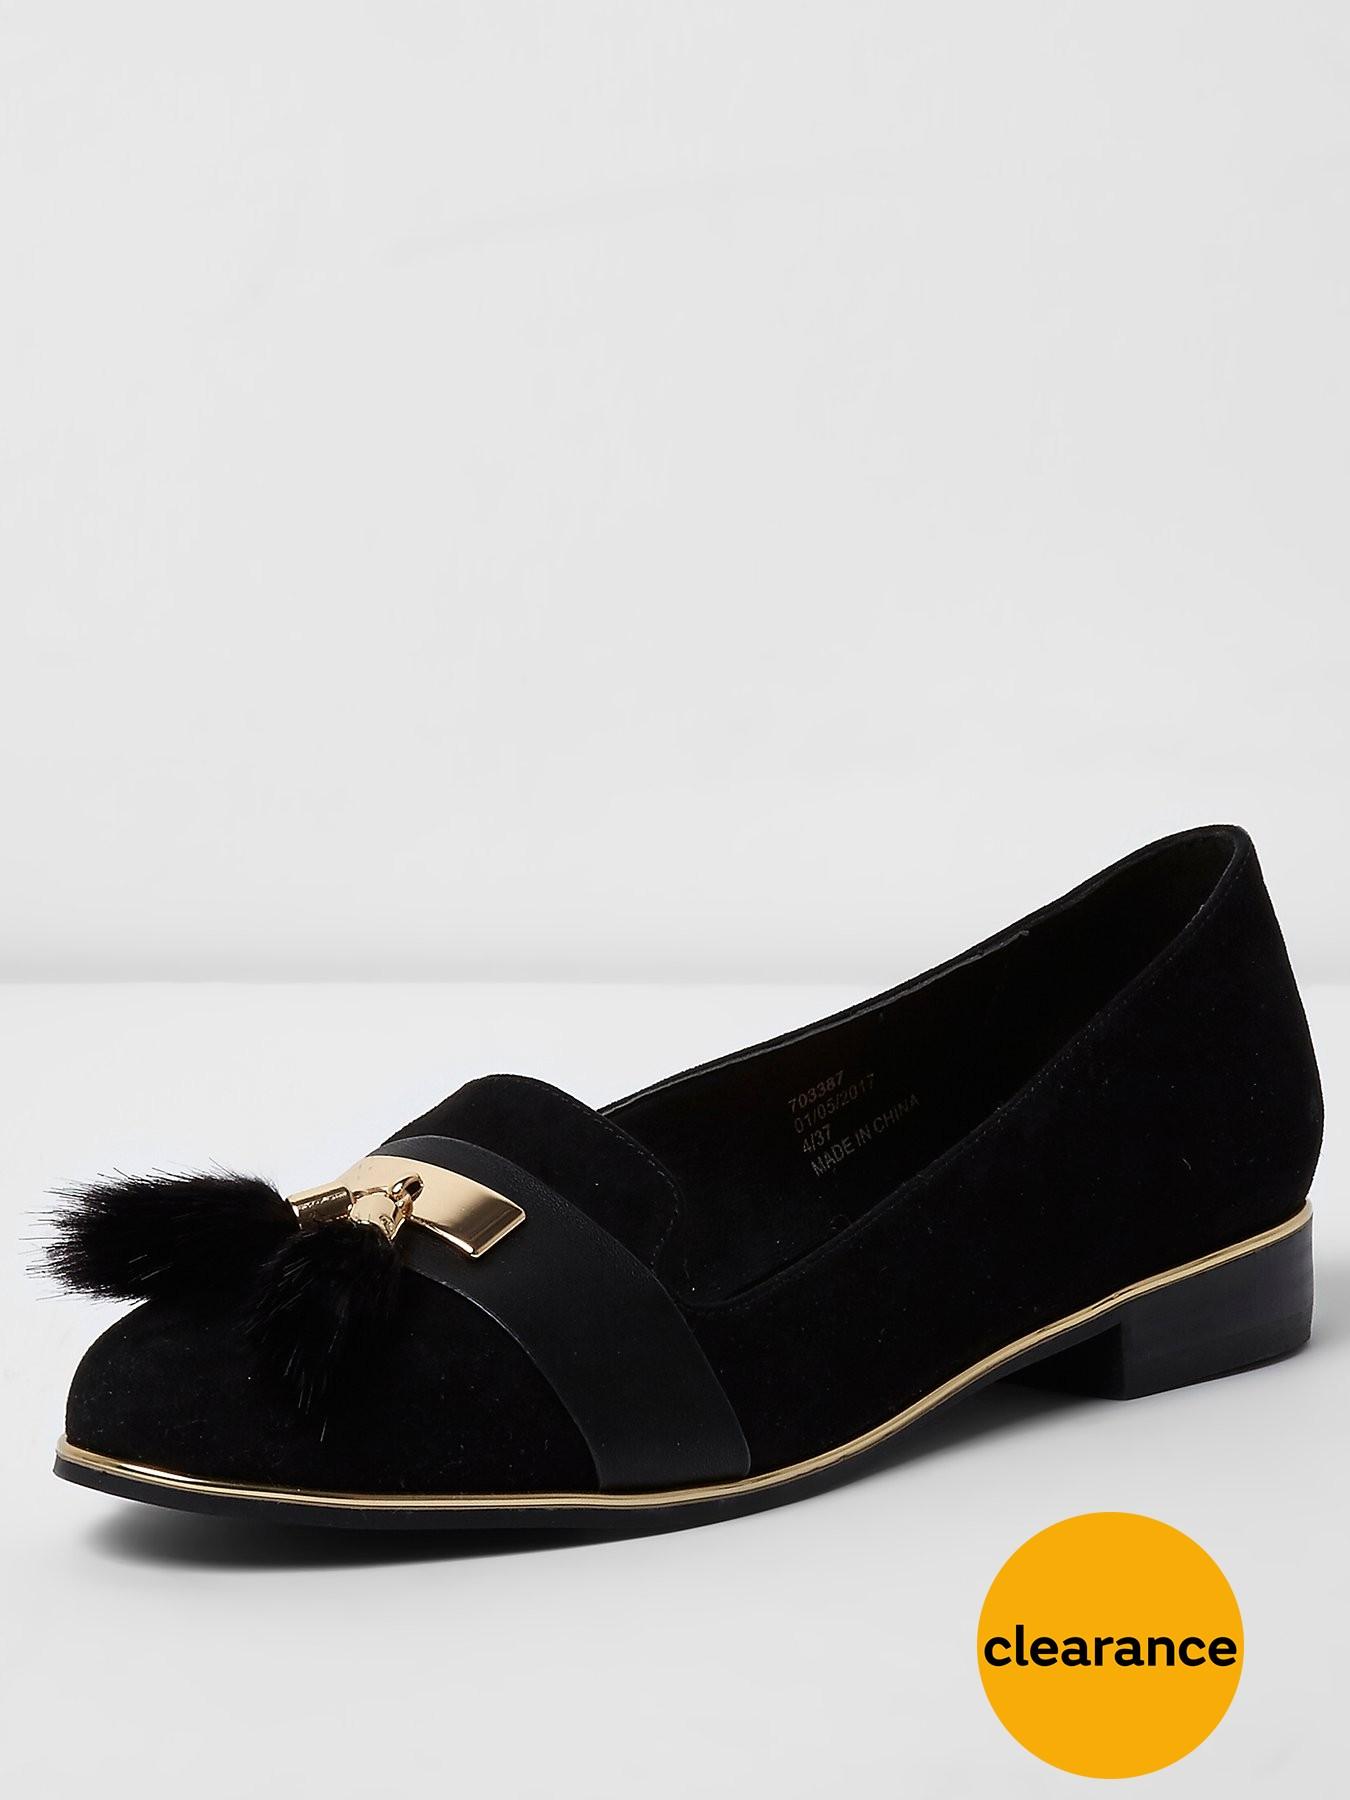 River Island Black Rat Slipper Shoe 1600171684 Women's Shoes River Island Flats